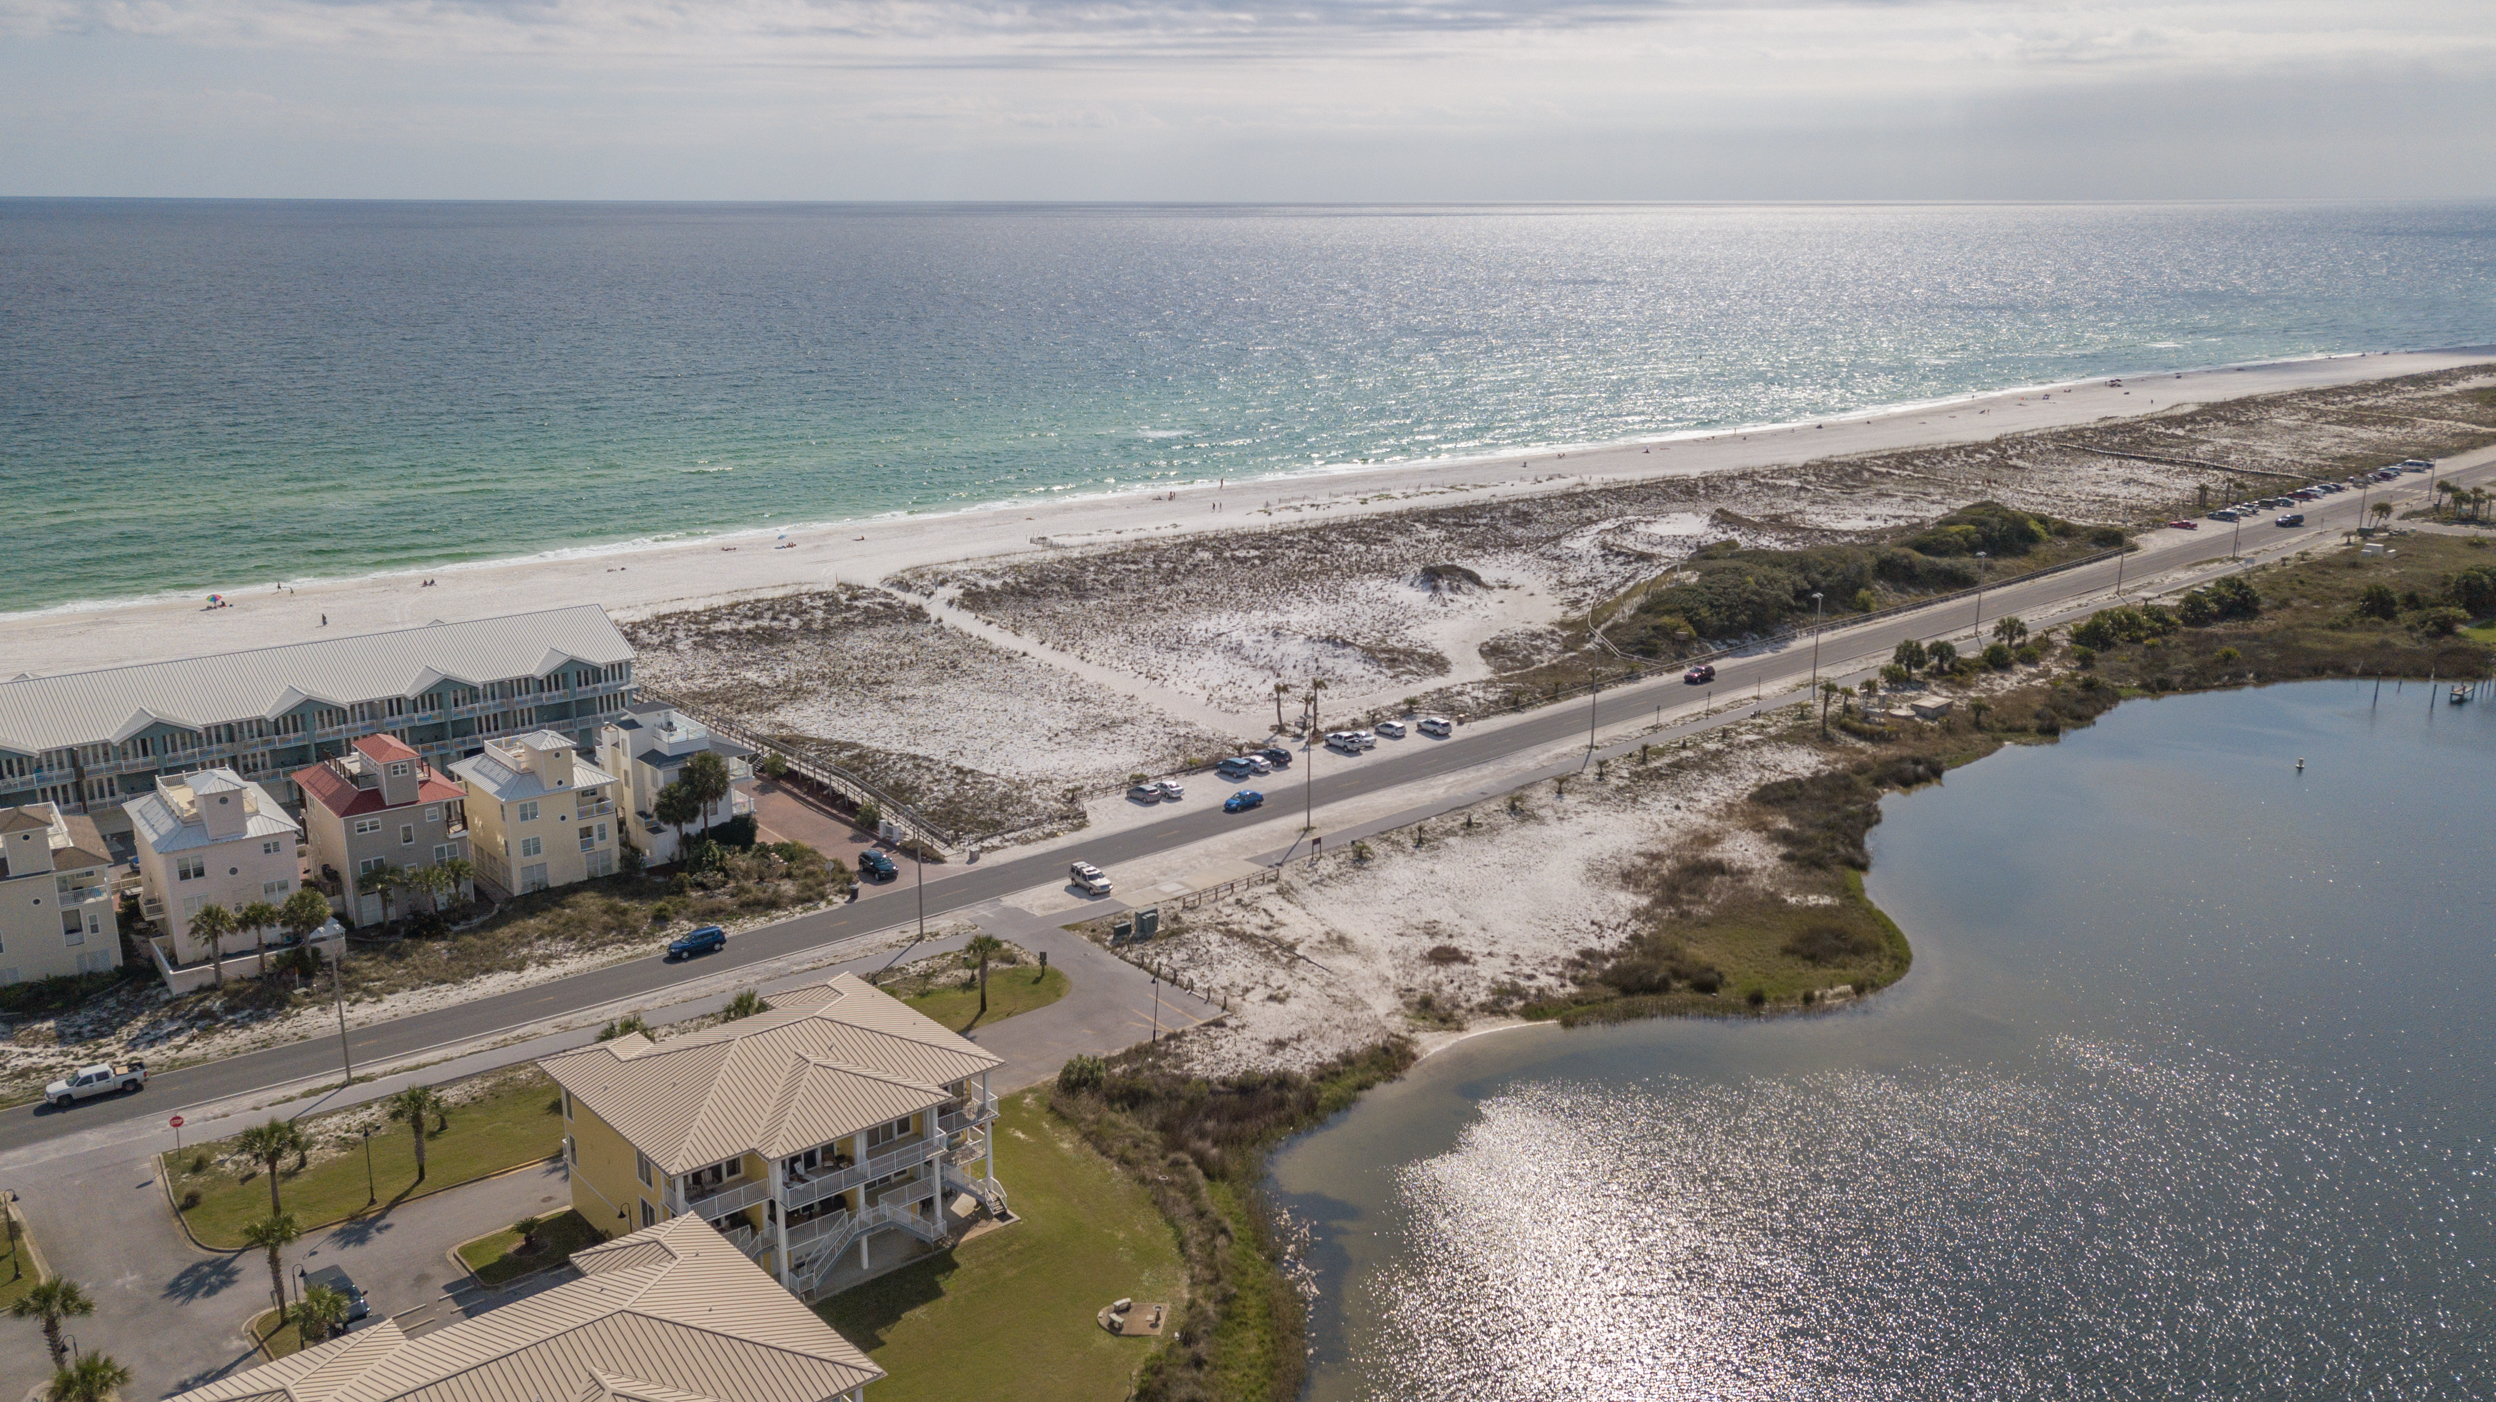 White Sands Cottage 501 Life's a Beach House Townhouse rental in White Sands Pensacola Beach in Pensacola Beach Florida - #66